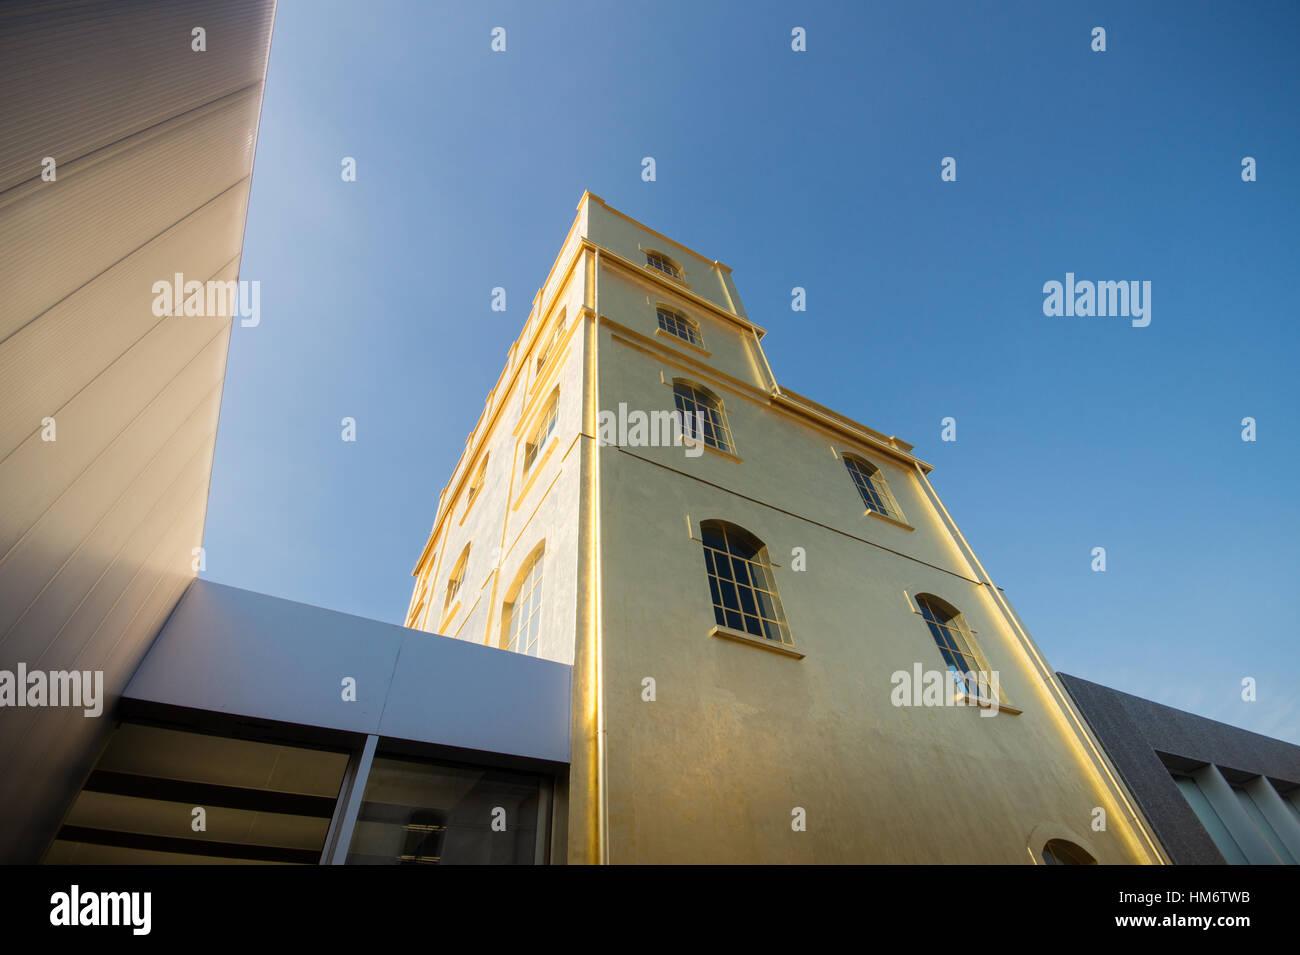 Fondazione Prada contemporary art museum Milano designed by Rem Koolhaas exterior view - Stock Image